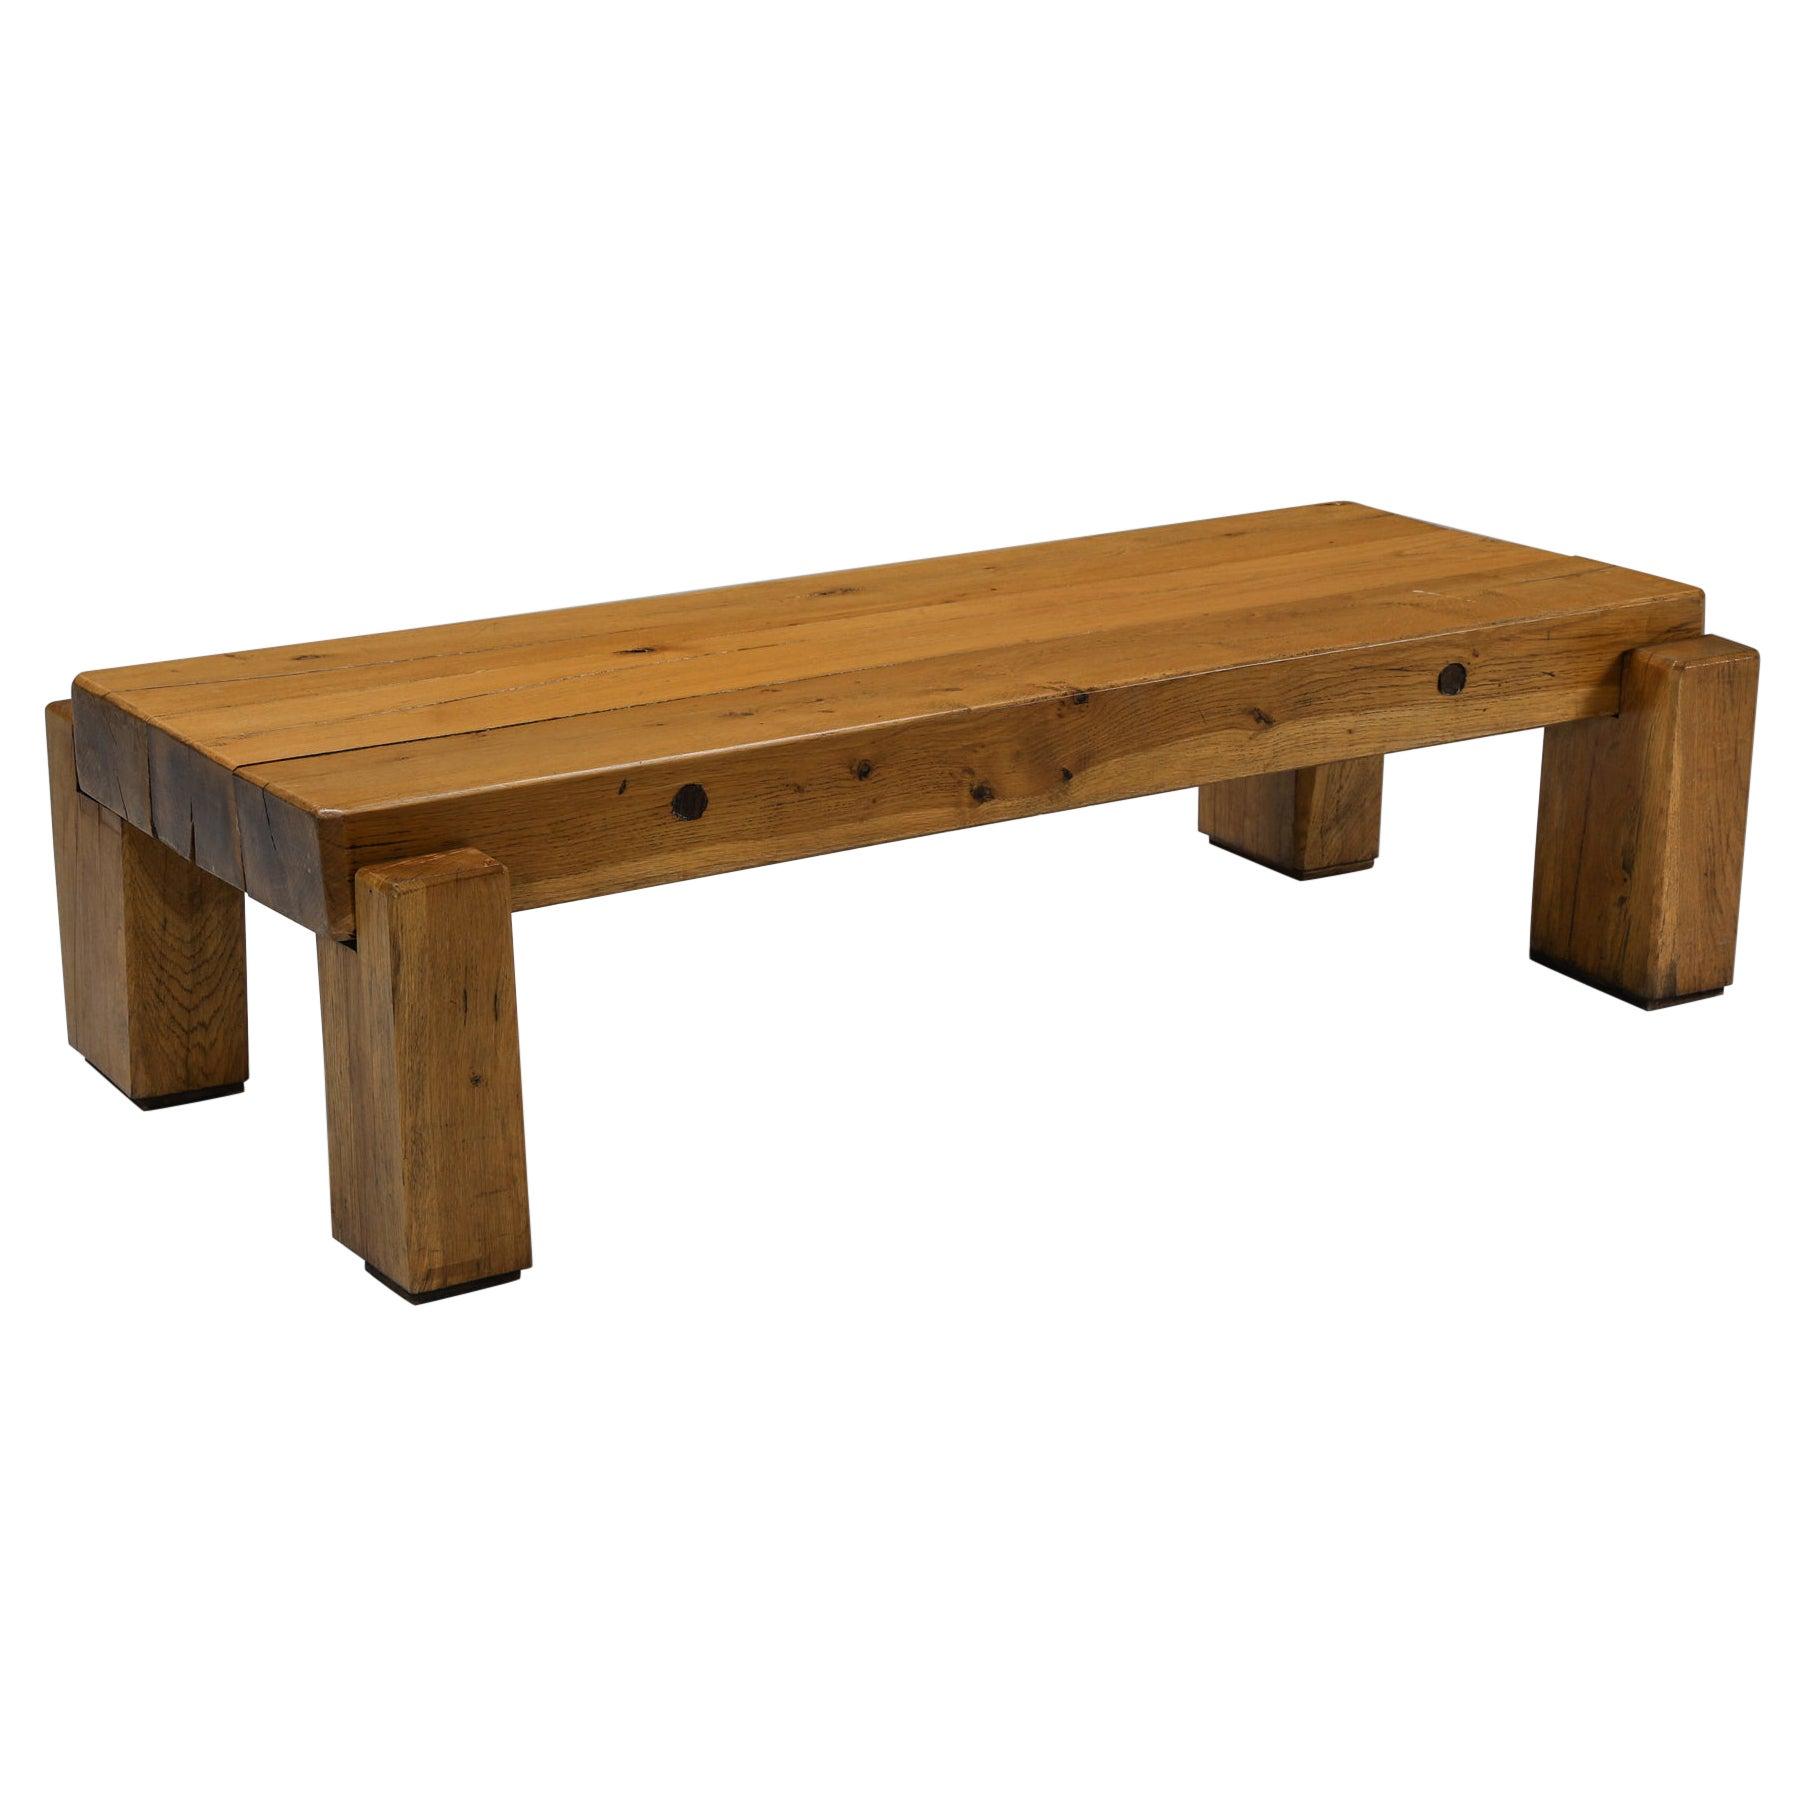 Rustic Wabi-Sabi Wooden Salon Table